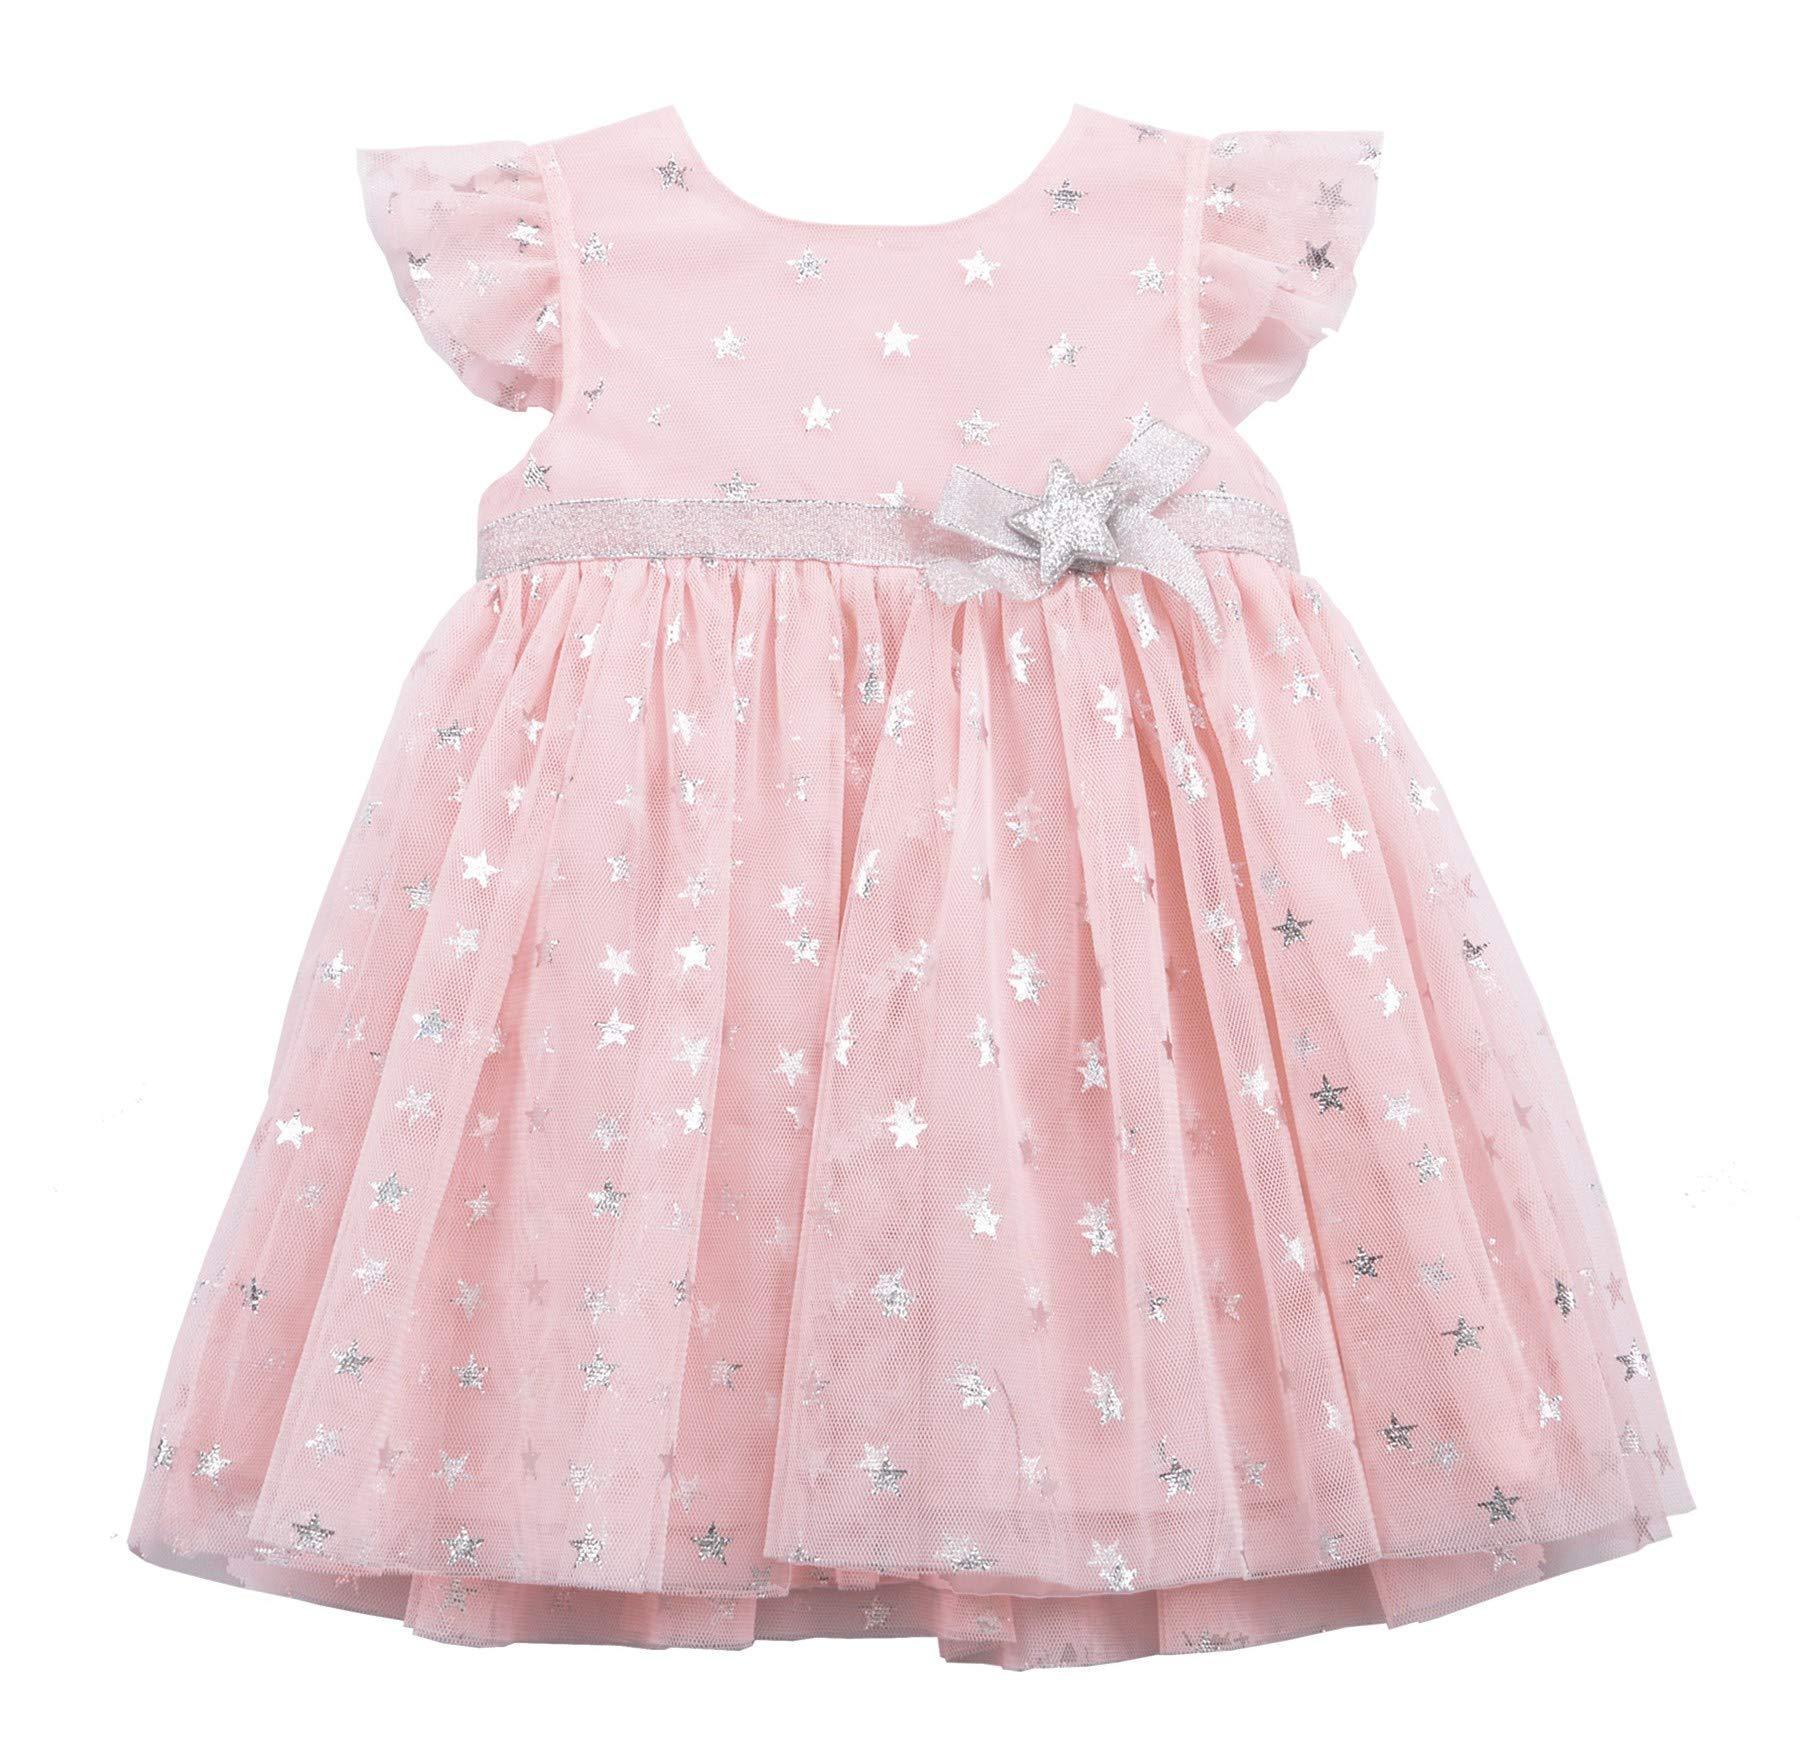 For Beloved Children Newborn Infant Baby Girls Dresses Kids Tutu Tulle Birthday Wedding Party Special Occasion Playwear 0-24 Months (12 Month, Pink 1629)